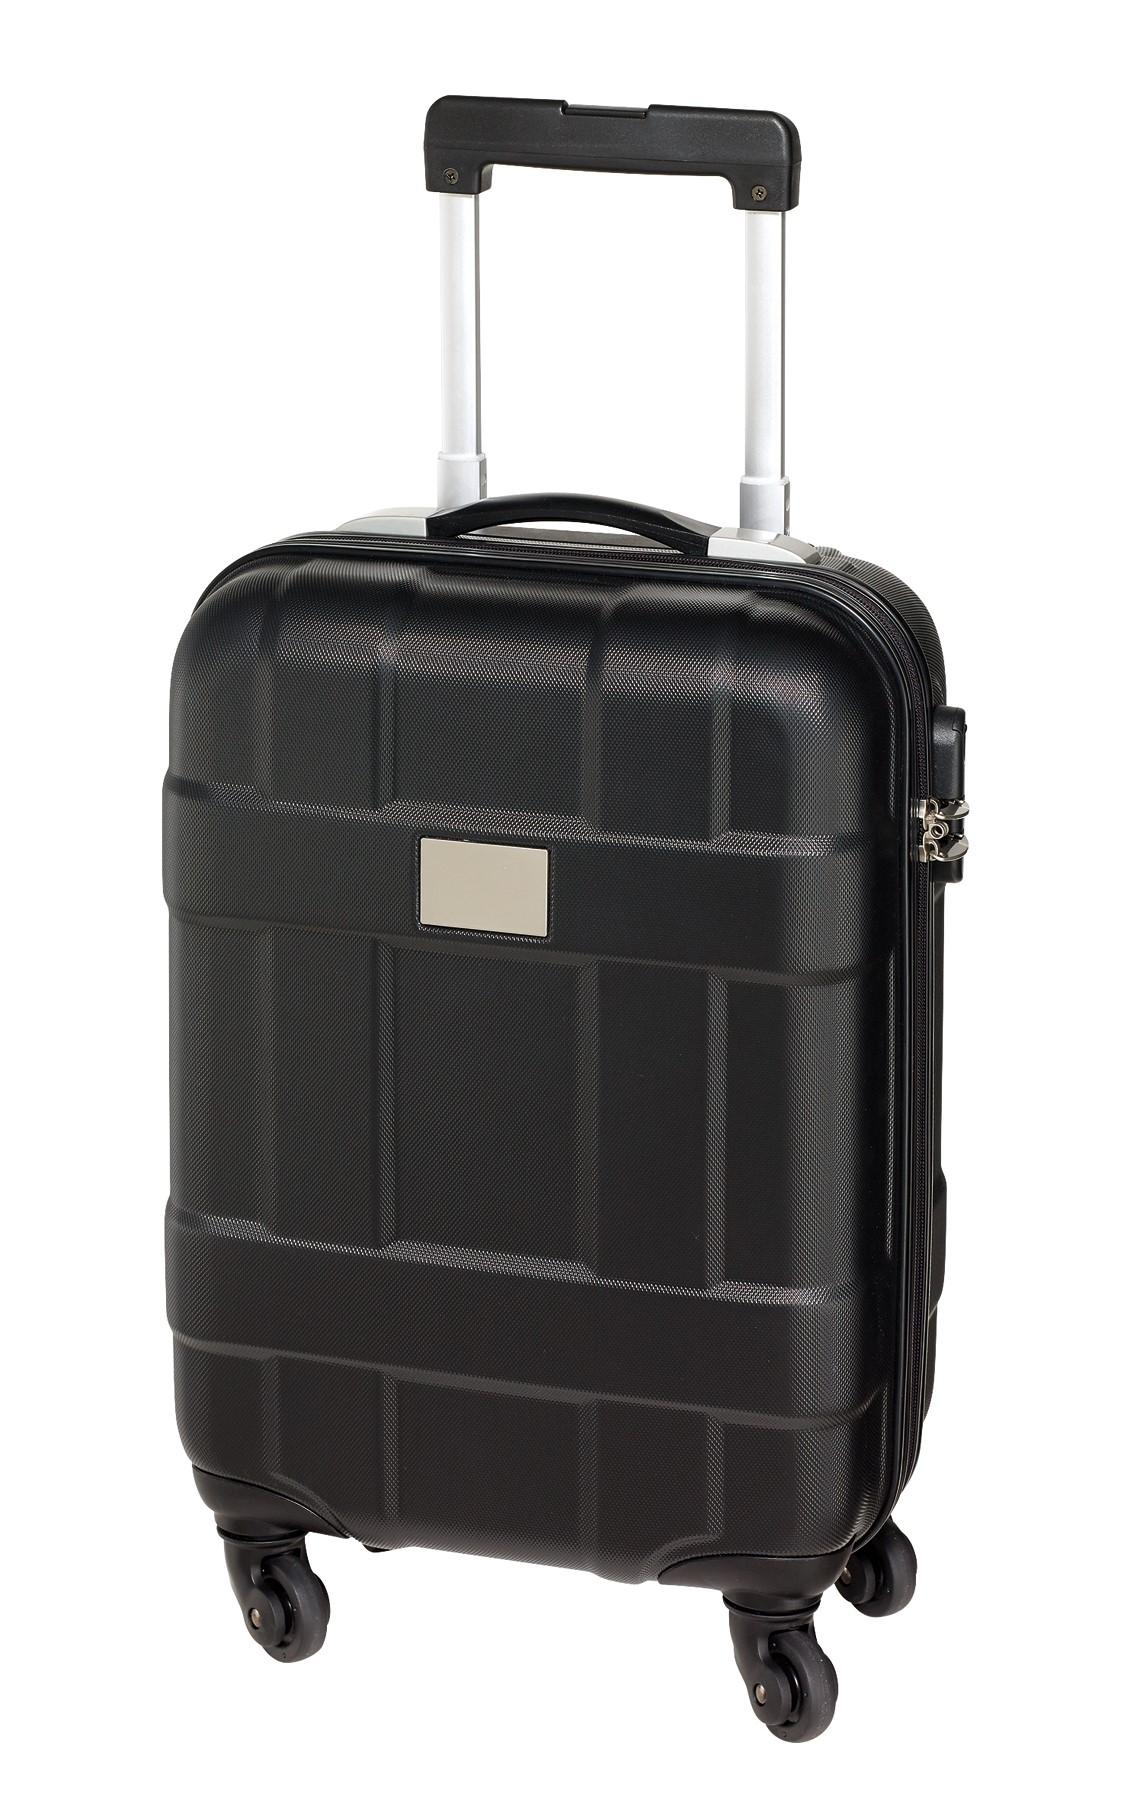 Méret MONZA gurulós kabin bőrönd   bélelt. ac1fc2ca60